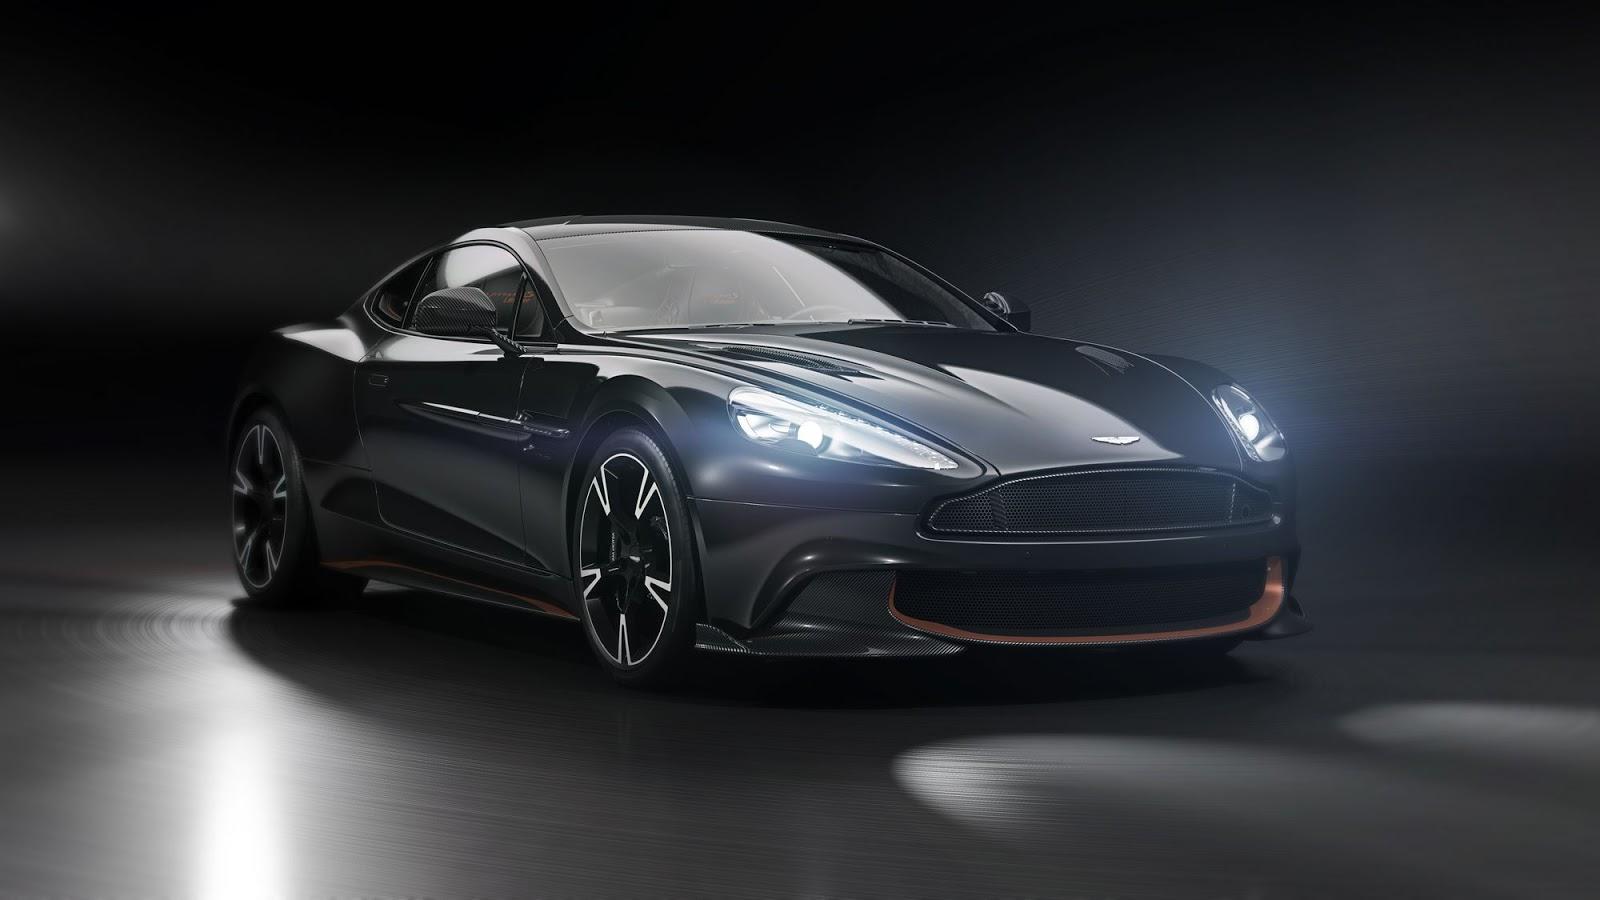 Aston-Martin-Vanquish-S-Ultimate-1